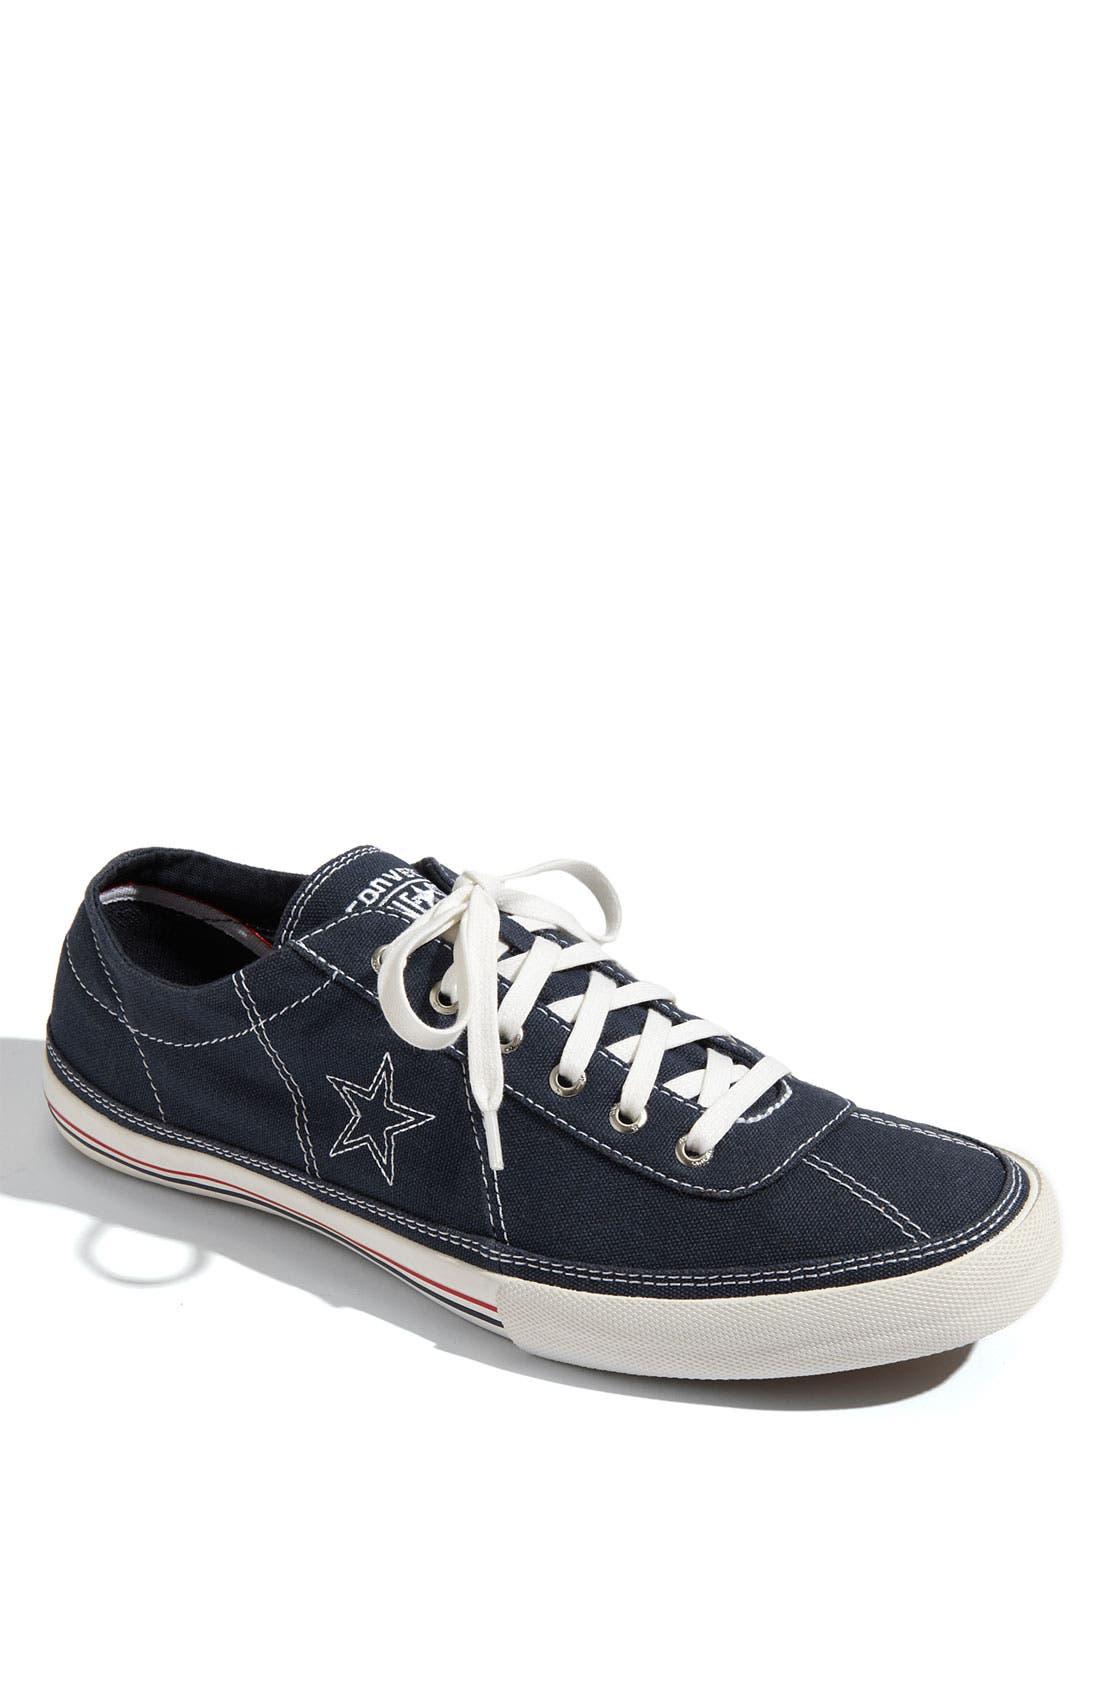 Alternate Image 1 Selected - Converse 'One Star Baseline' Sneaker